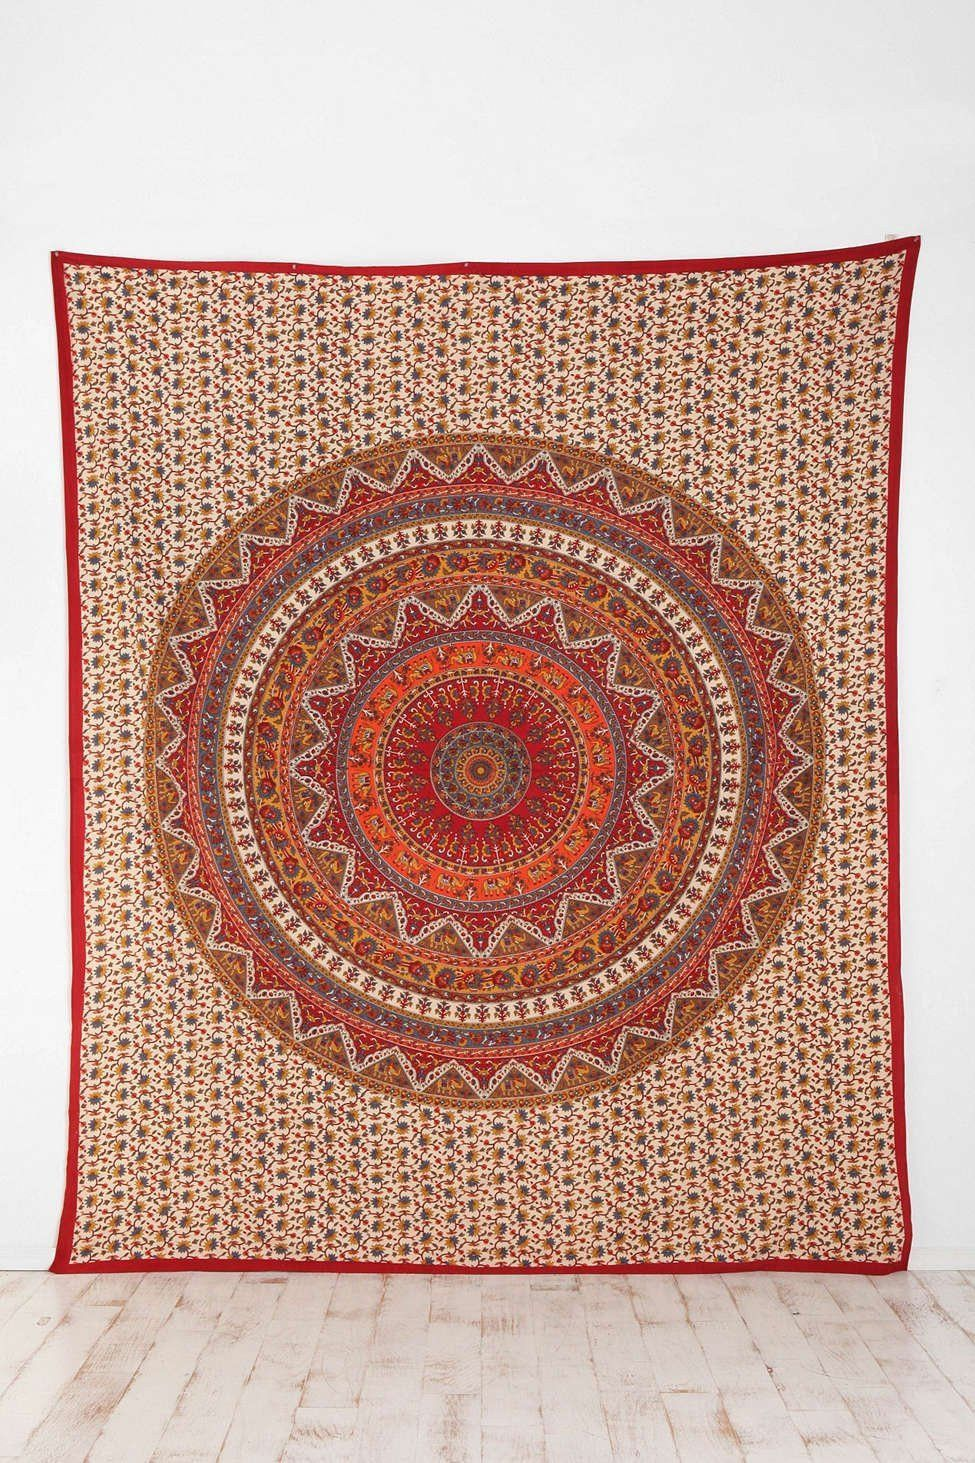 Hanging Rugs Trendyystuff Indian Mandala Tapestry Hippie Hippy Wall Hanging